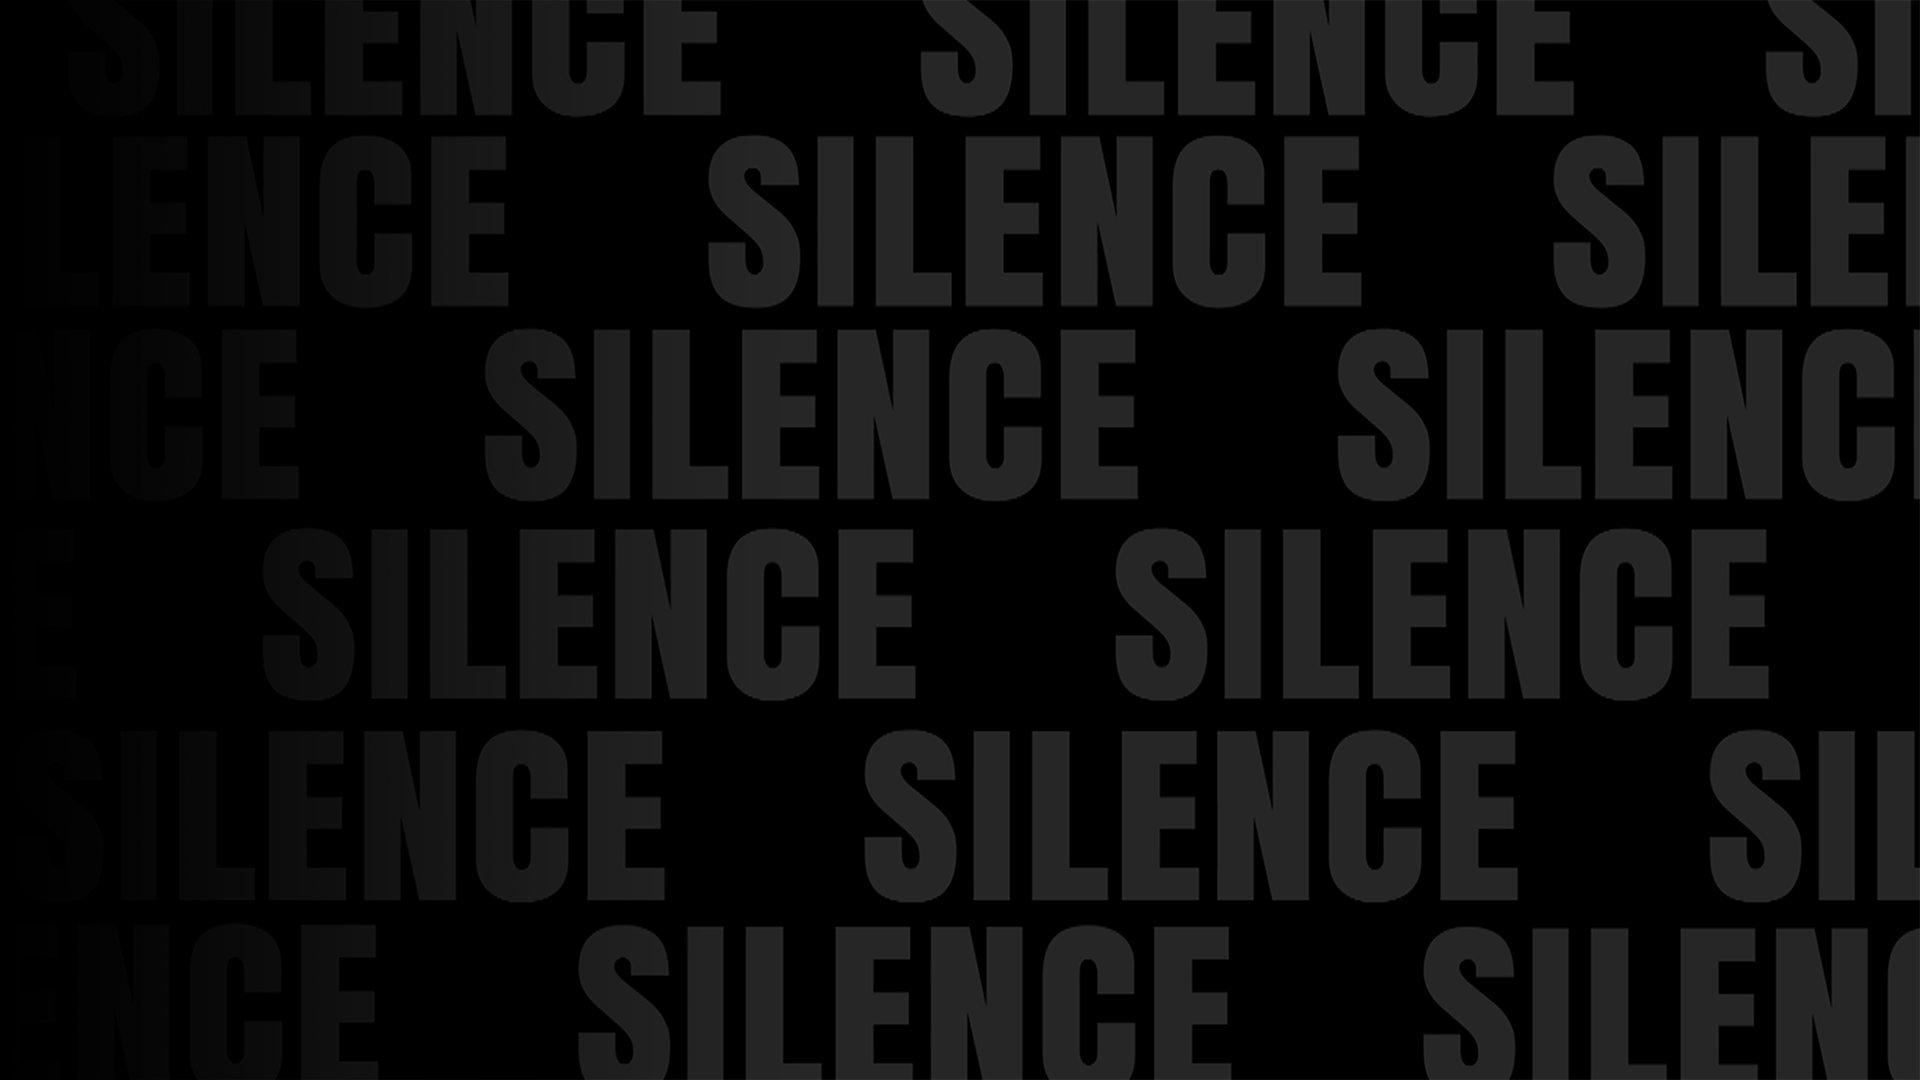 fond L'année du silence